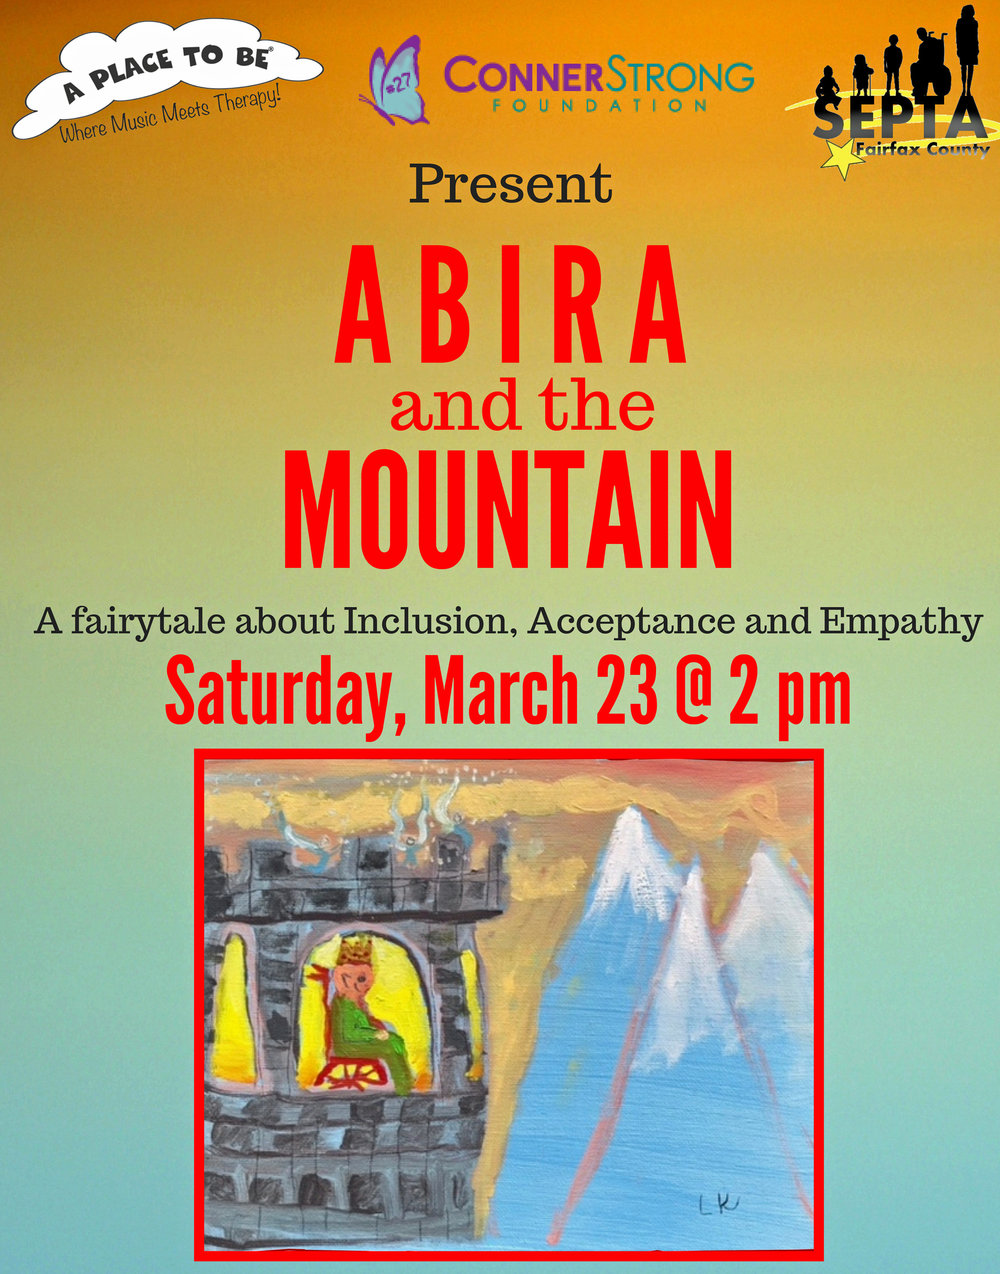 Abira-Poster-with-URL.jpg